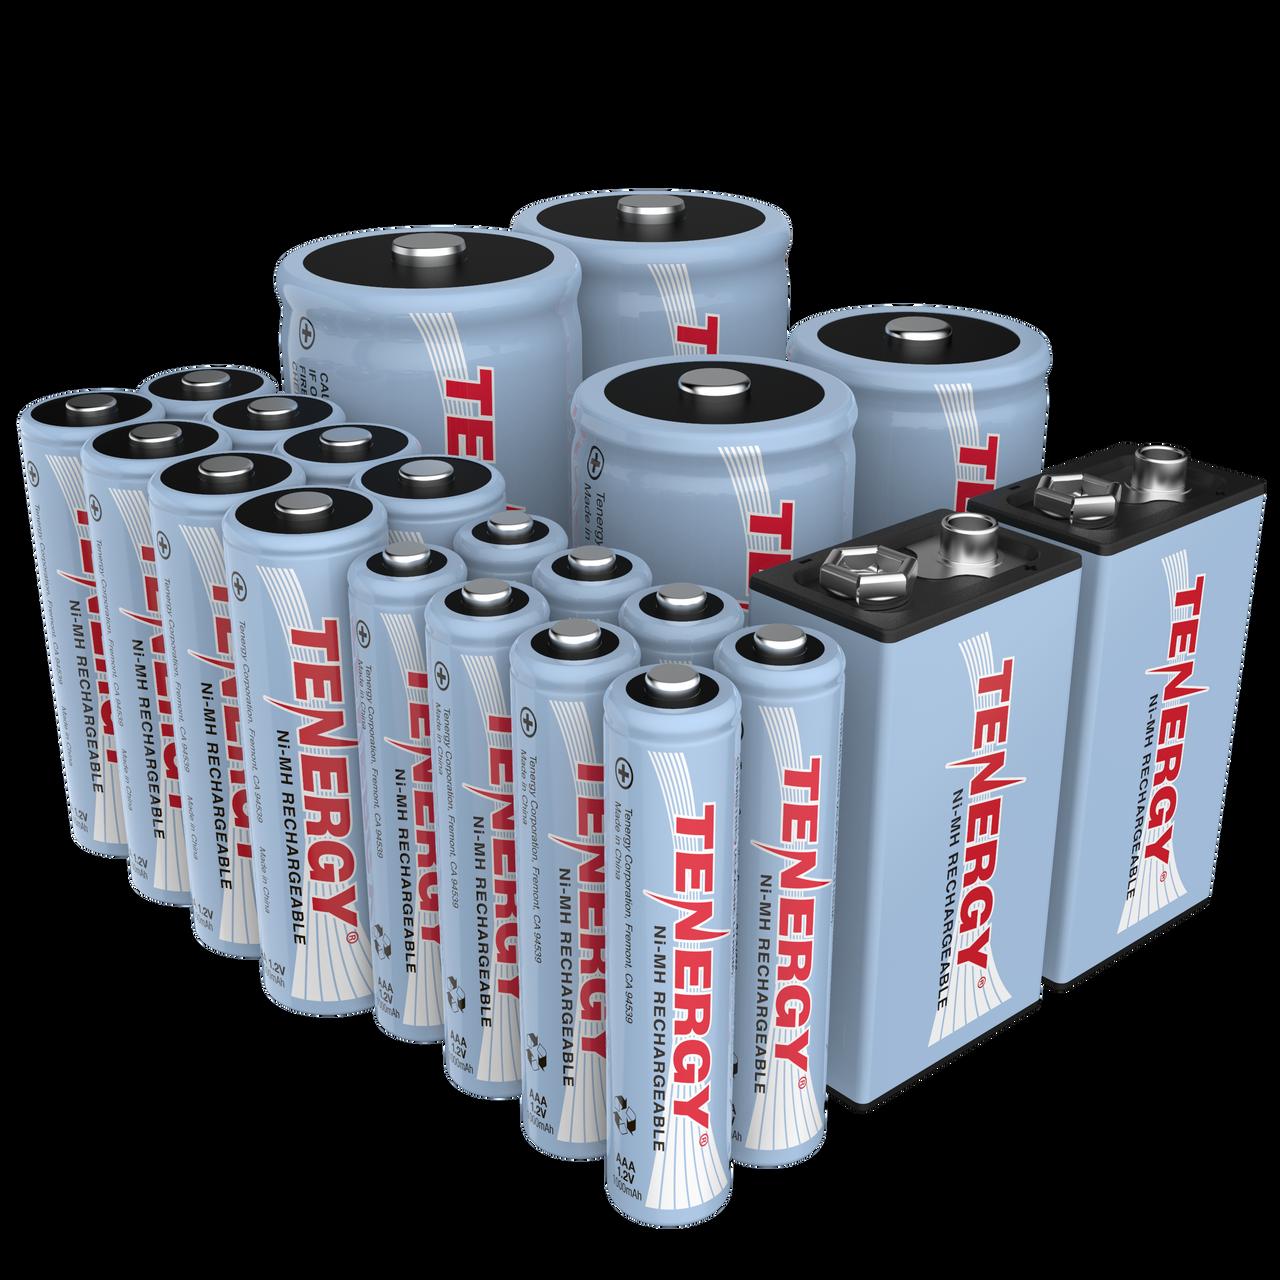 Combo: 22pcs Tenergy NiMH Rechargeable Batteries (8AA/8AAA/2C/2D/2 9V)